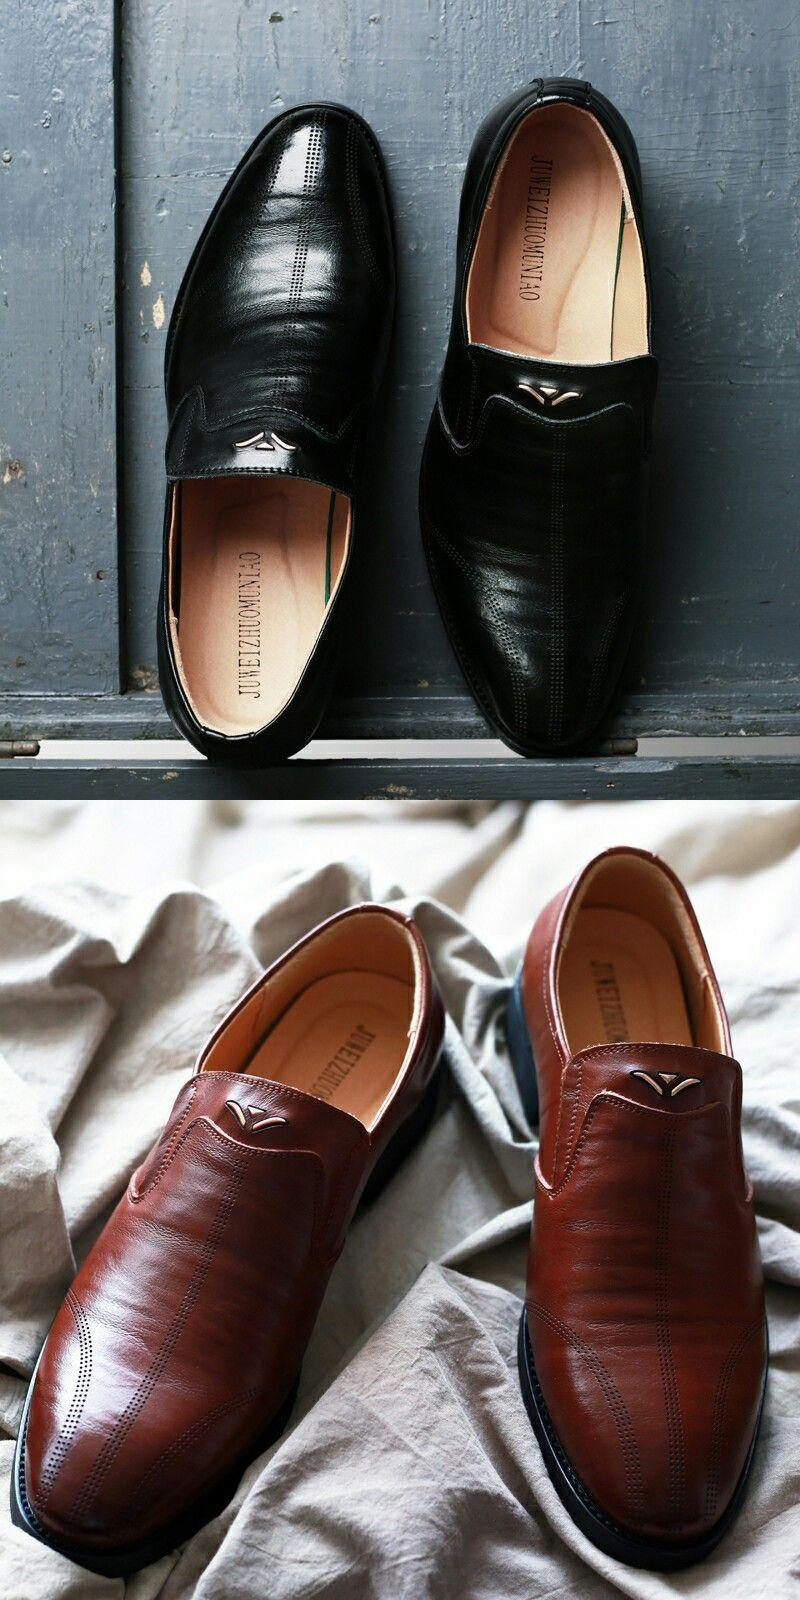 US  32.62 2018 New Design Man Business Shoes Flat Classic Men Dress Shoes  Cow Genuine Leather 0a195e348e9b